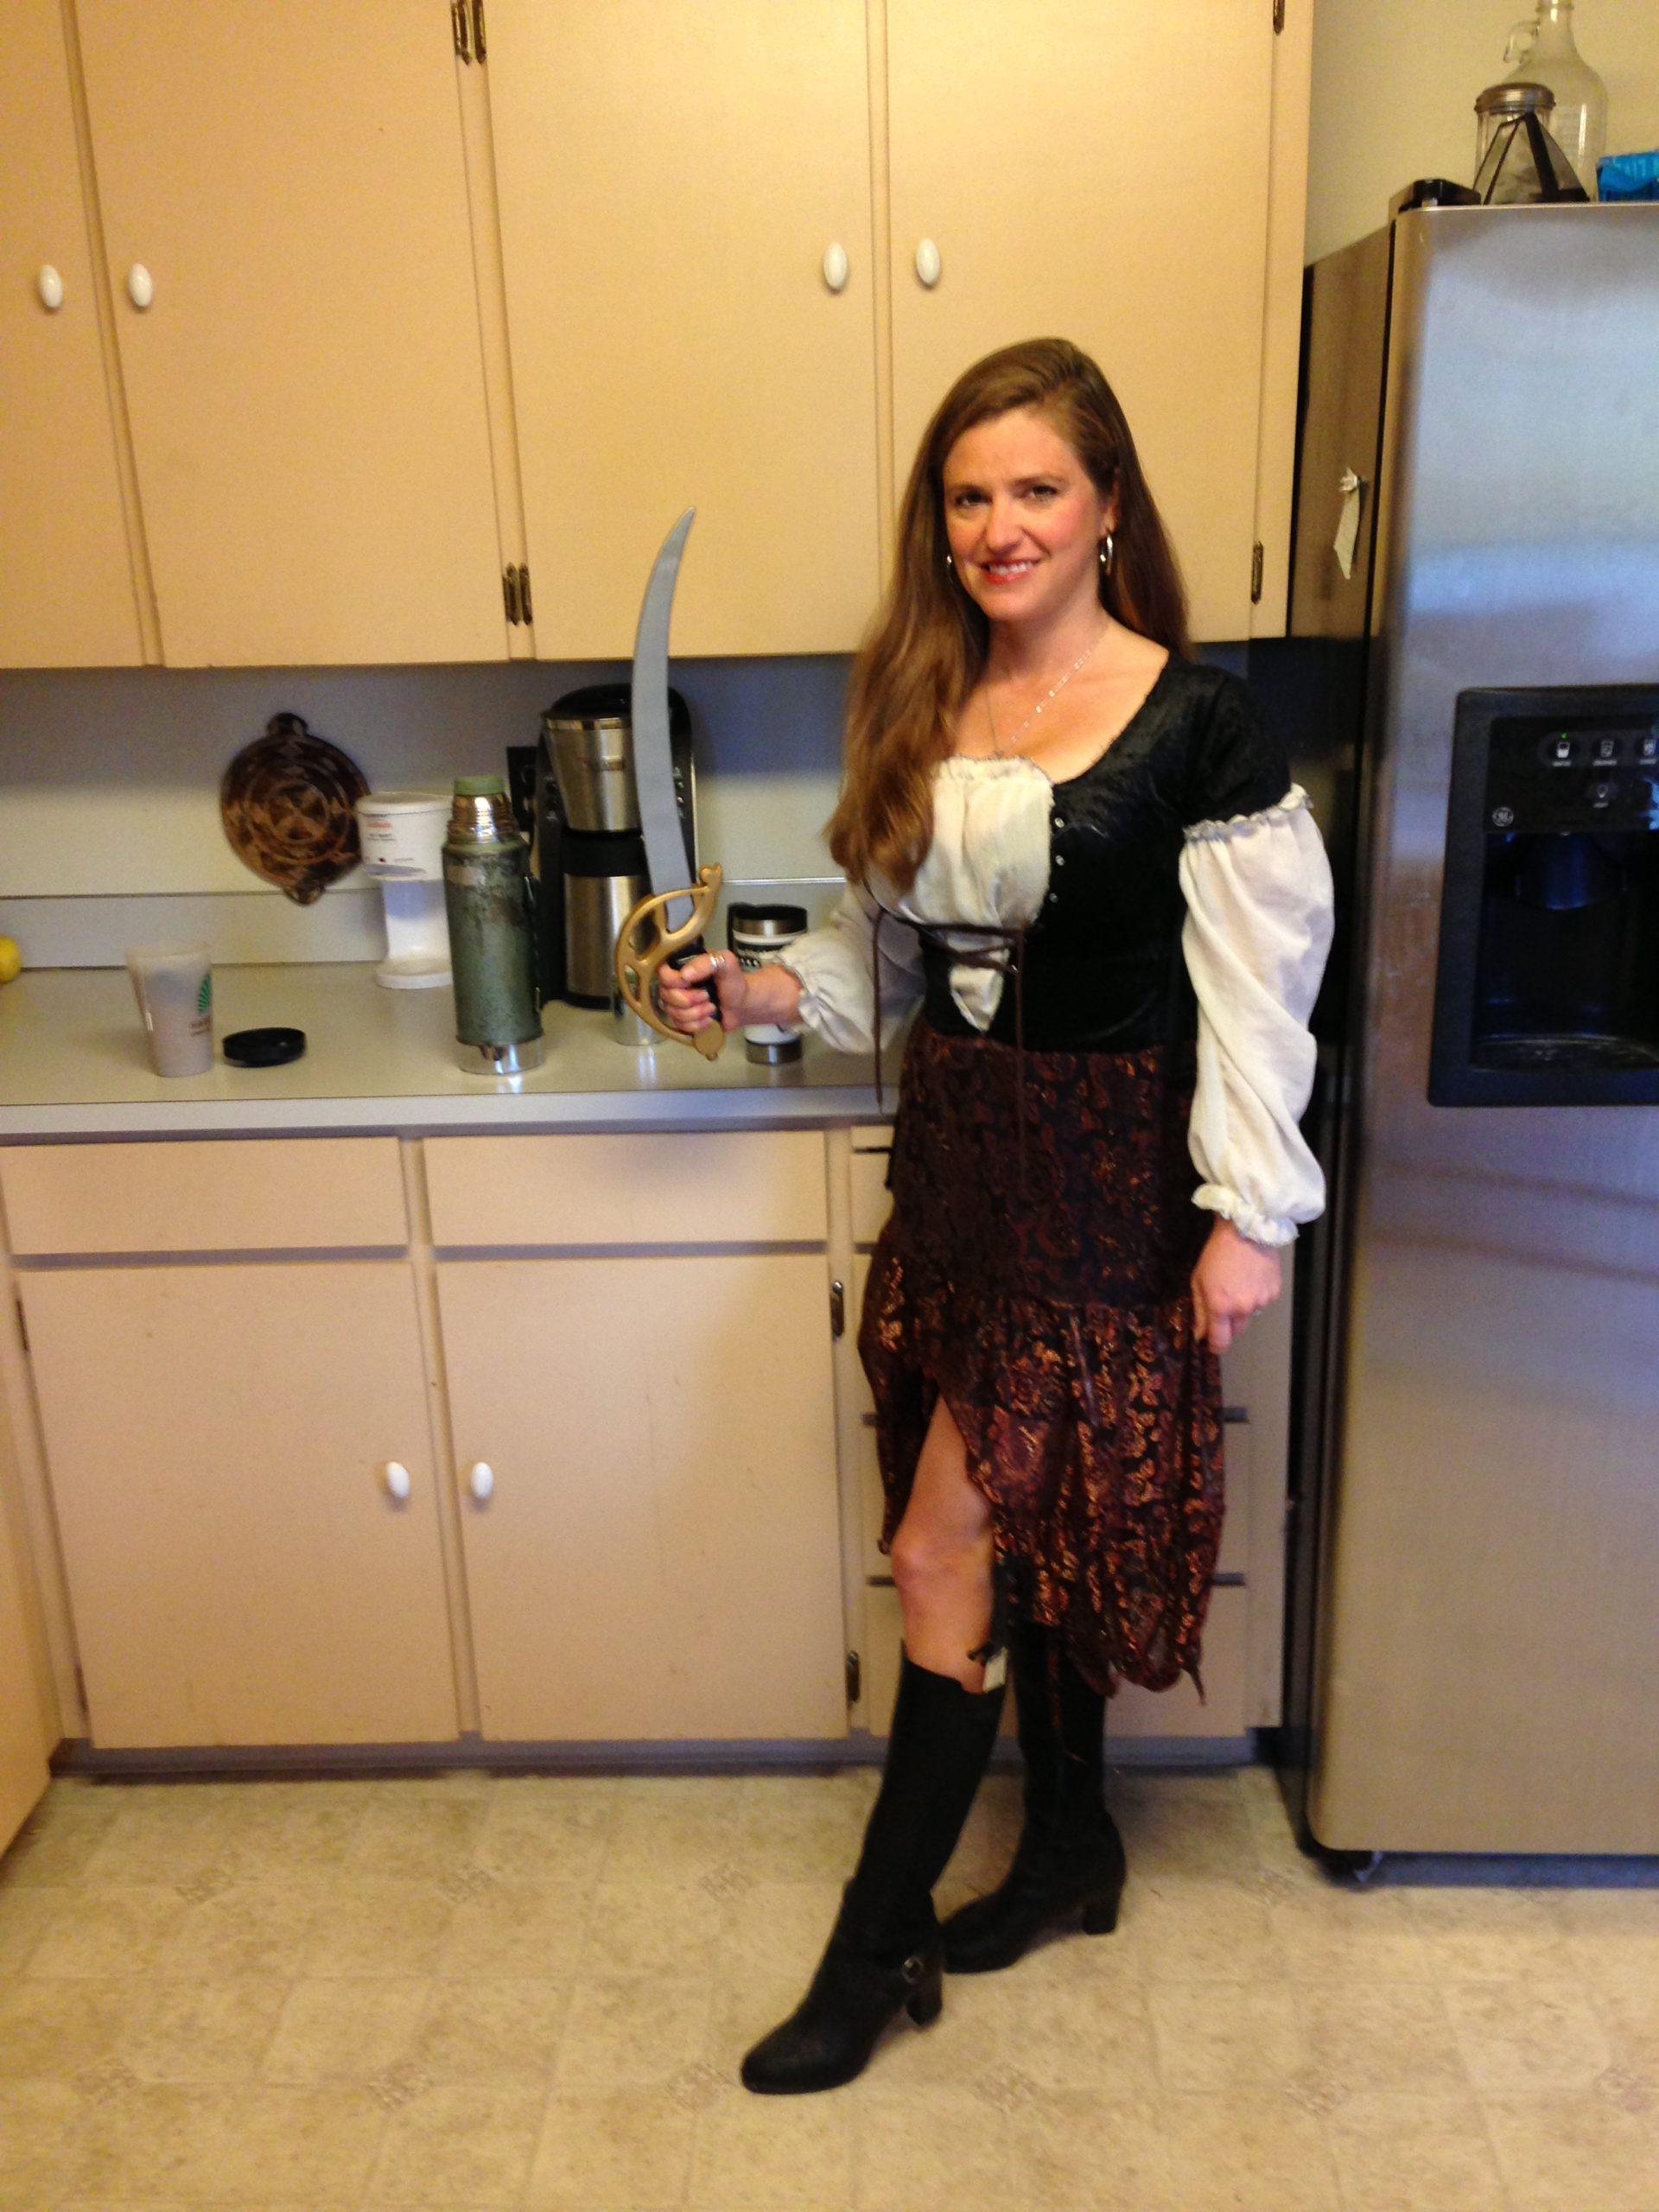 Tawna pirate costume